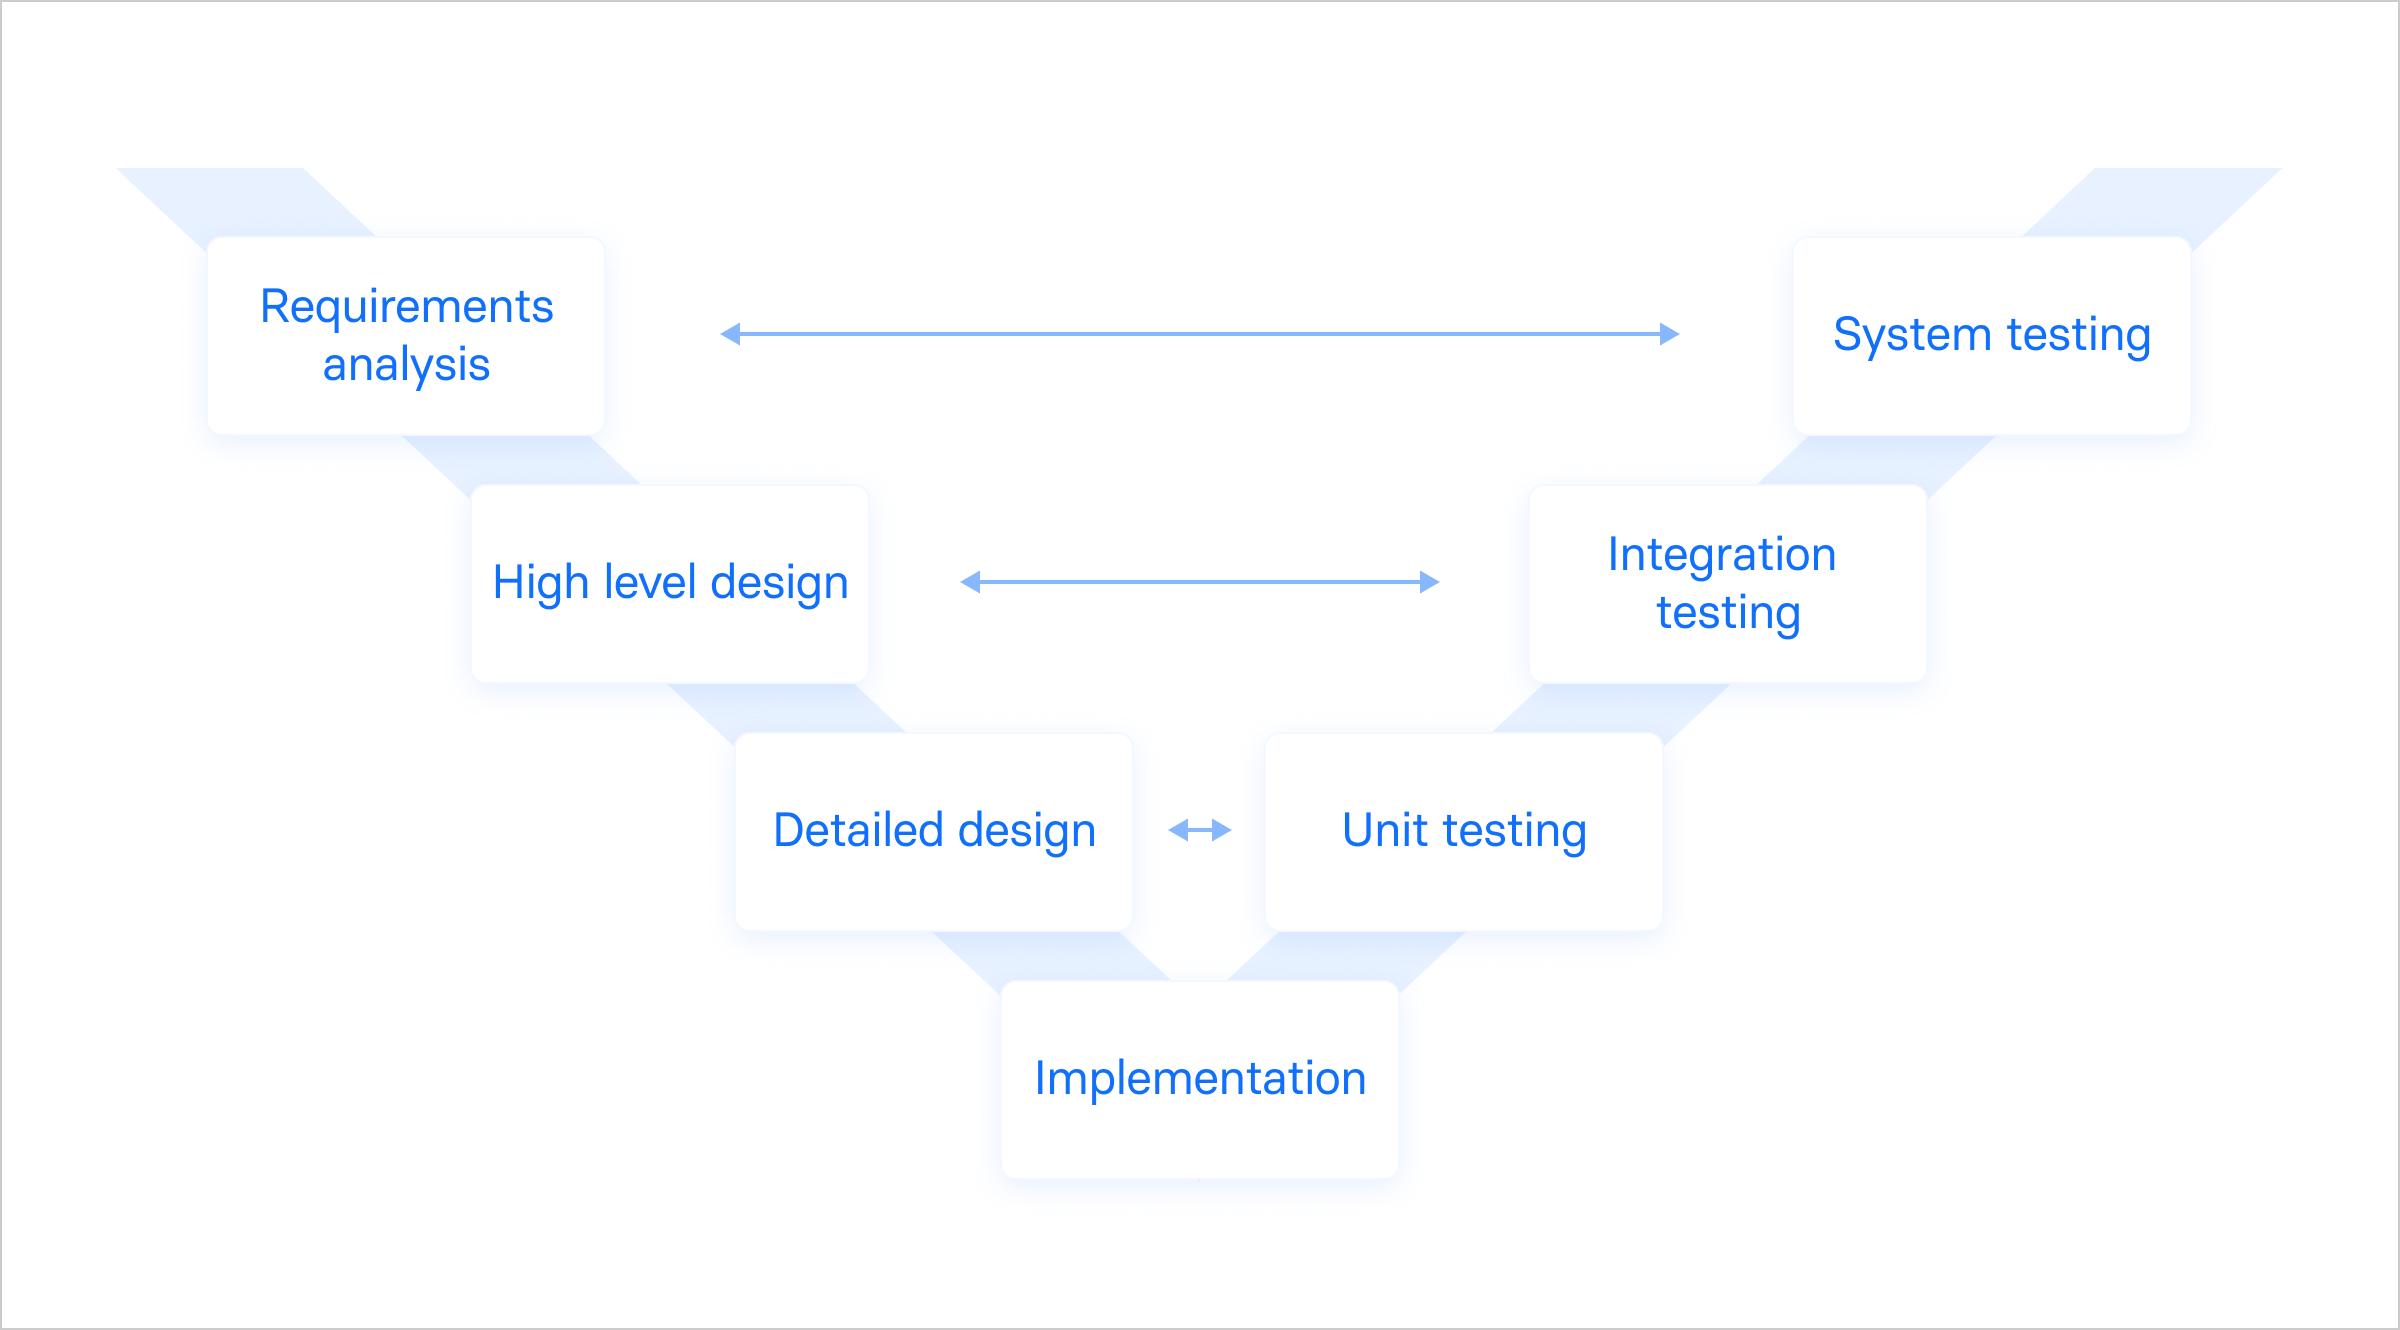 V 字モデル、自動運転システムのテストと検証のための参照モデル